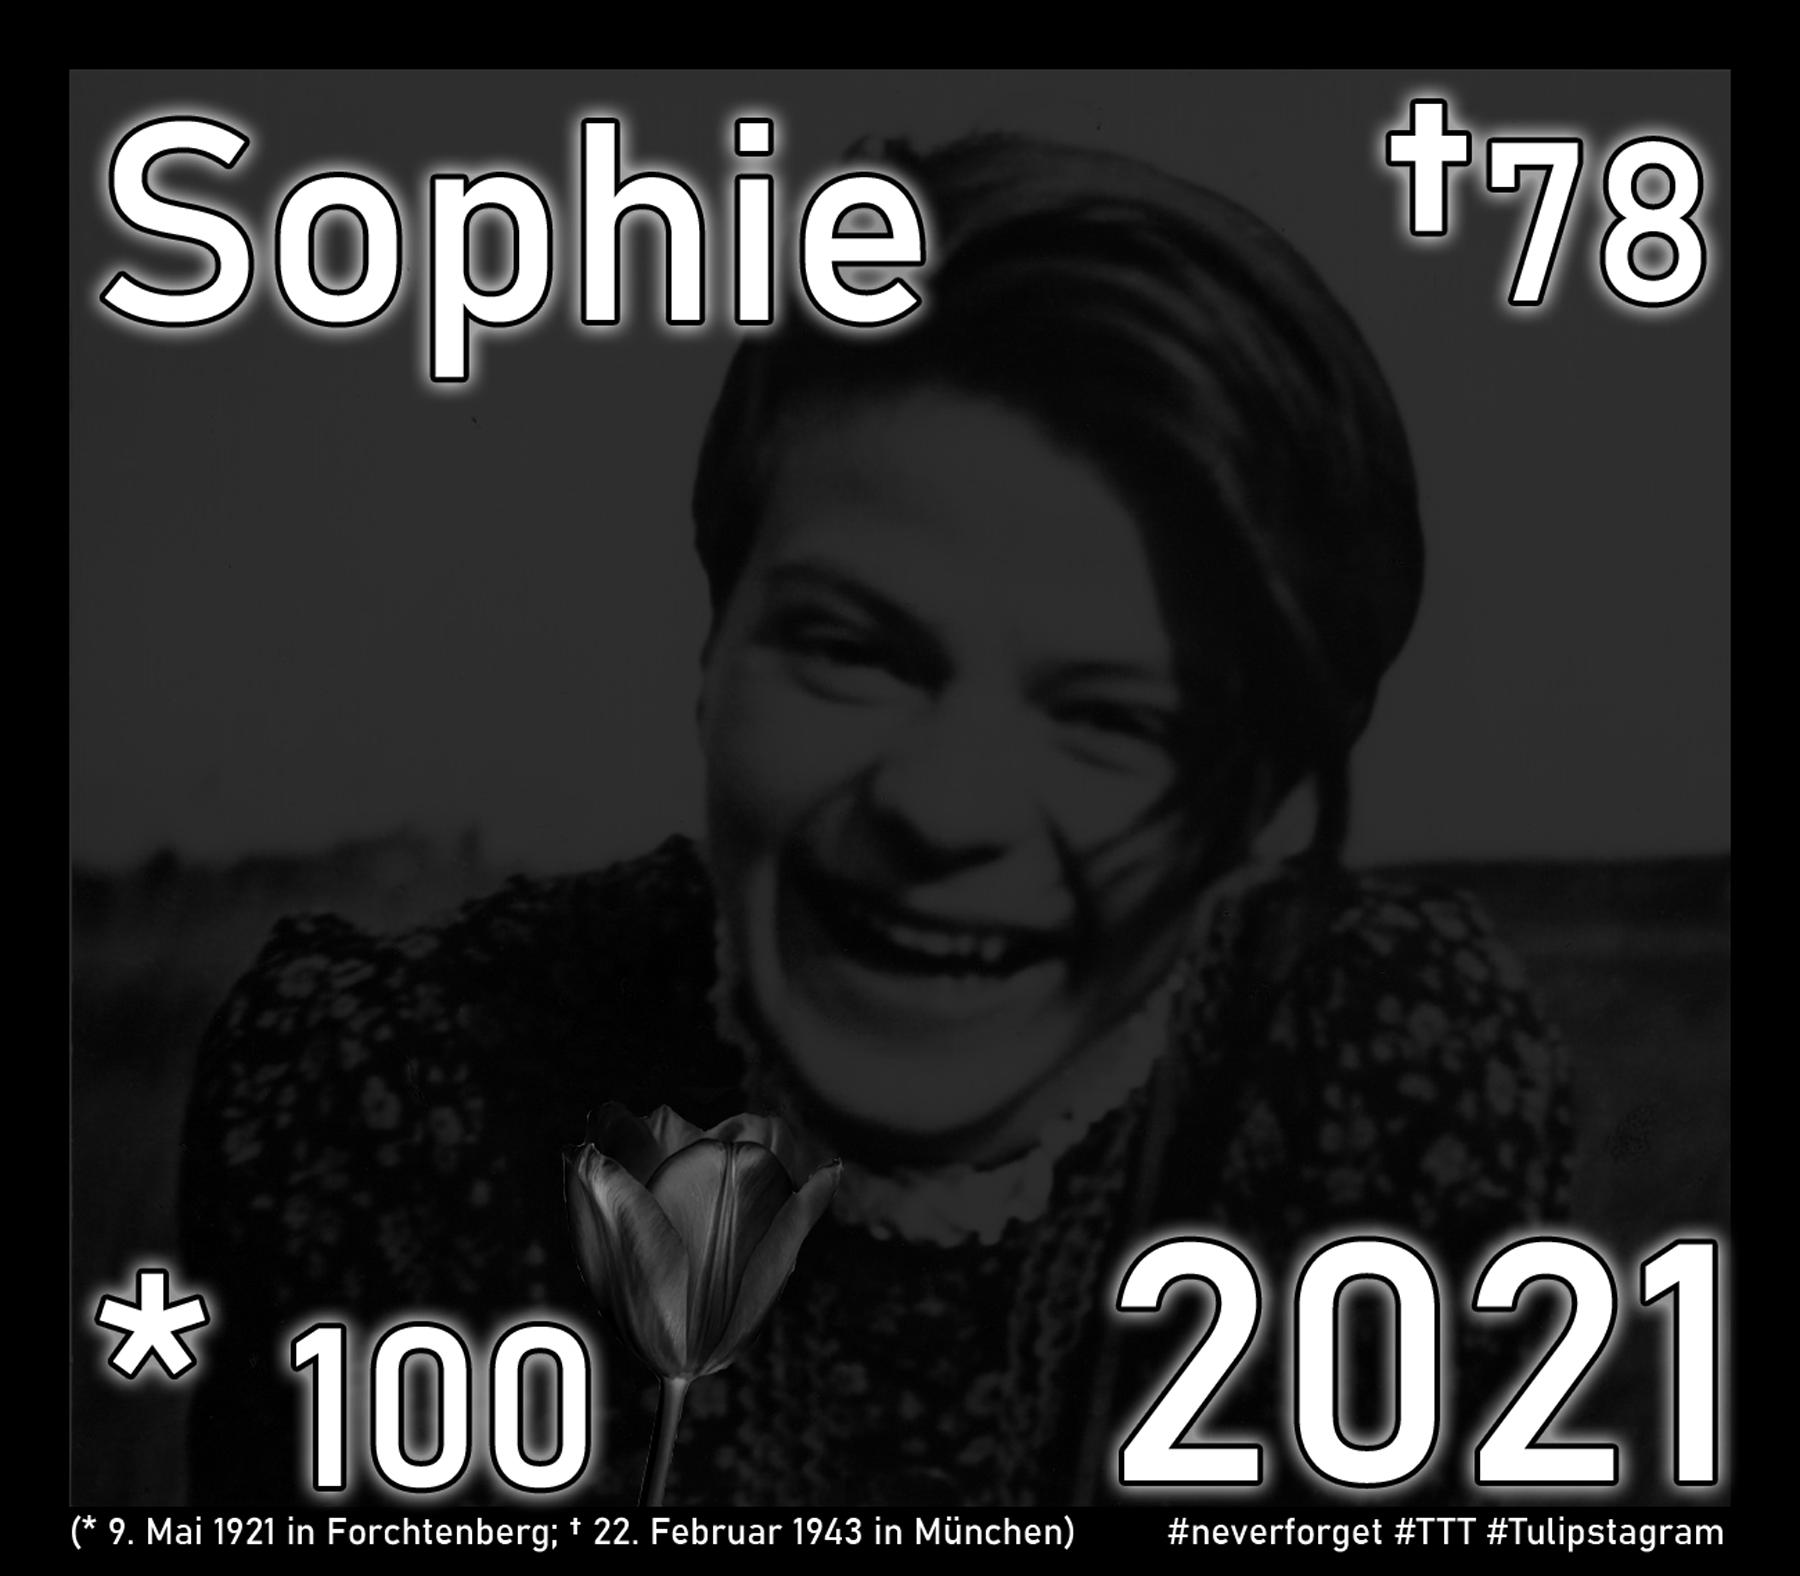 Sophie Scholl 2021 - #neverforget #TTT #Tulipstagram